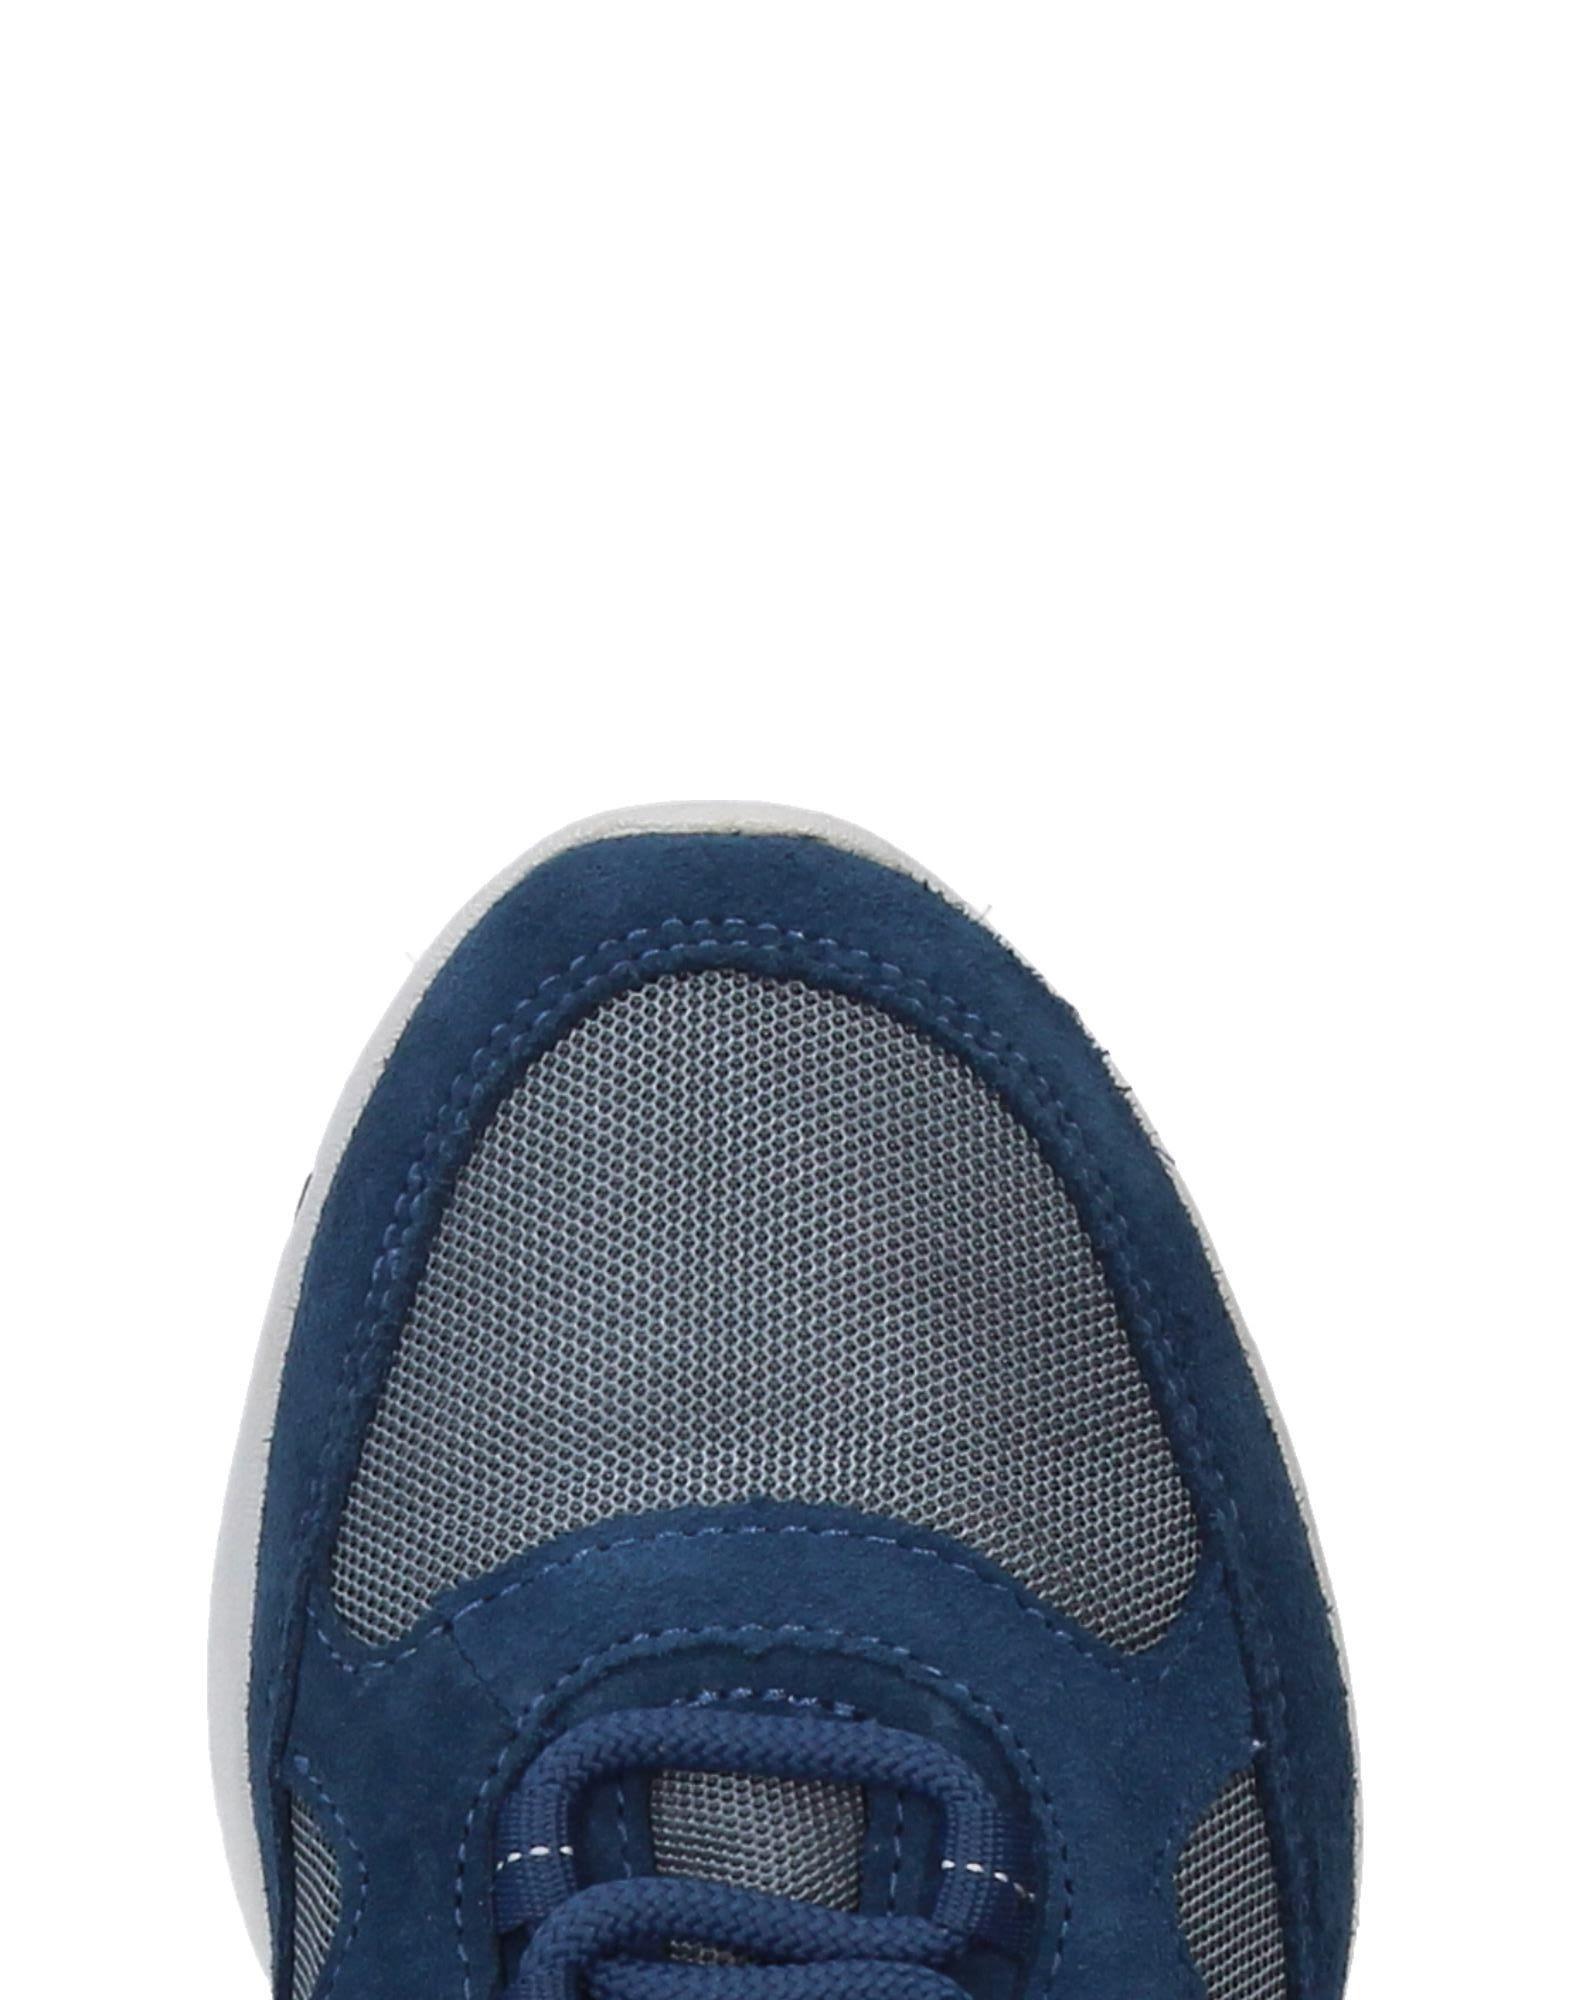 Geox Sneakers Damen  Gute 11415465EC Gute  Qualität beliebte Schuhe c2dc20